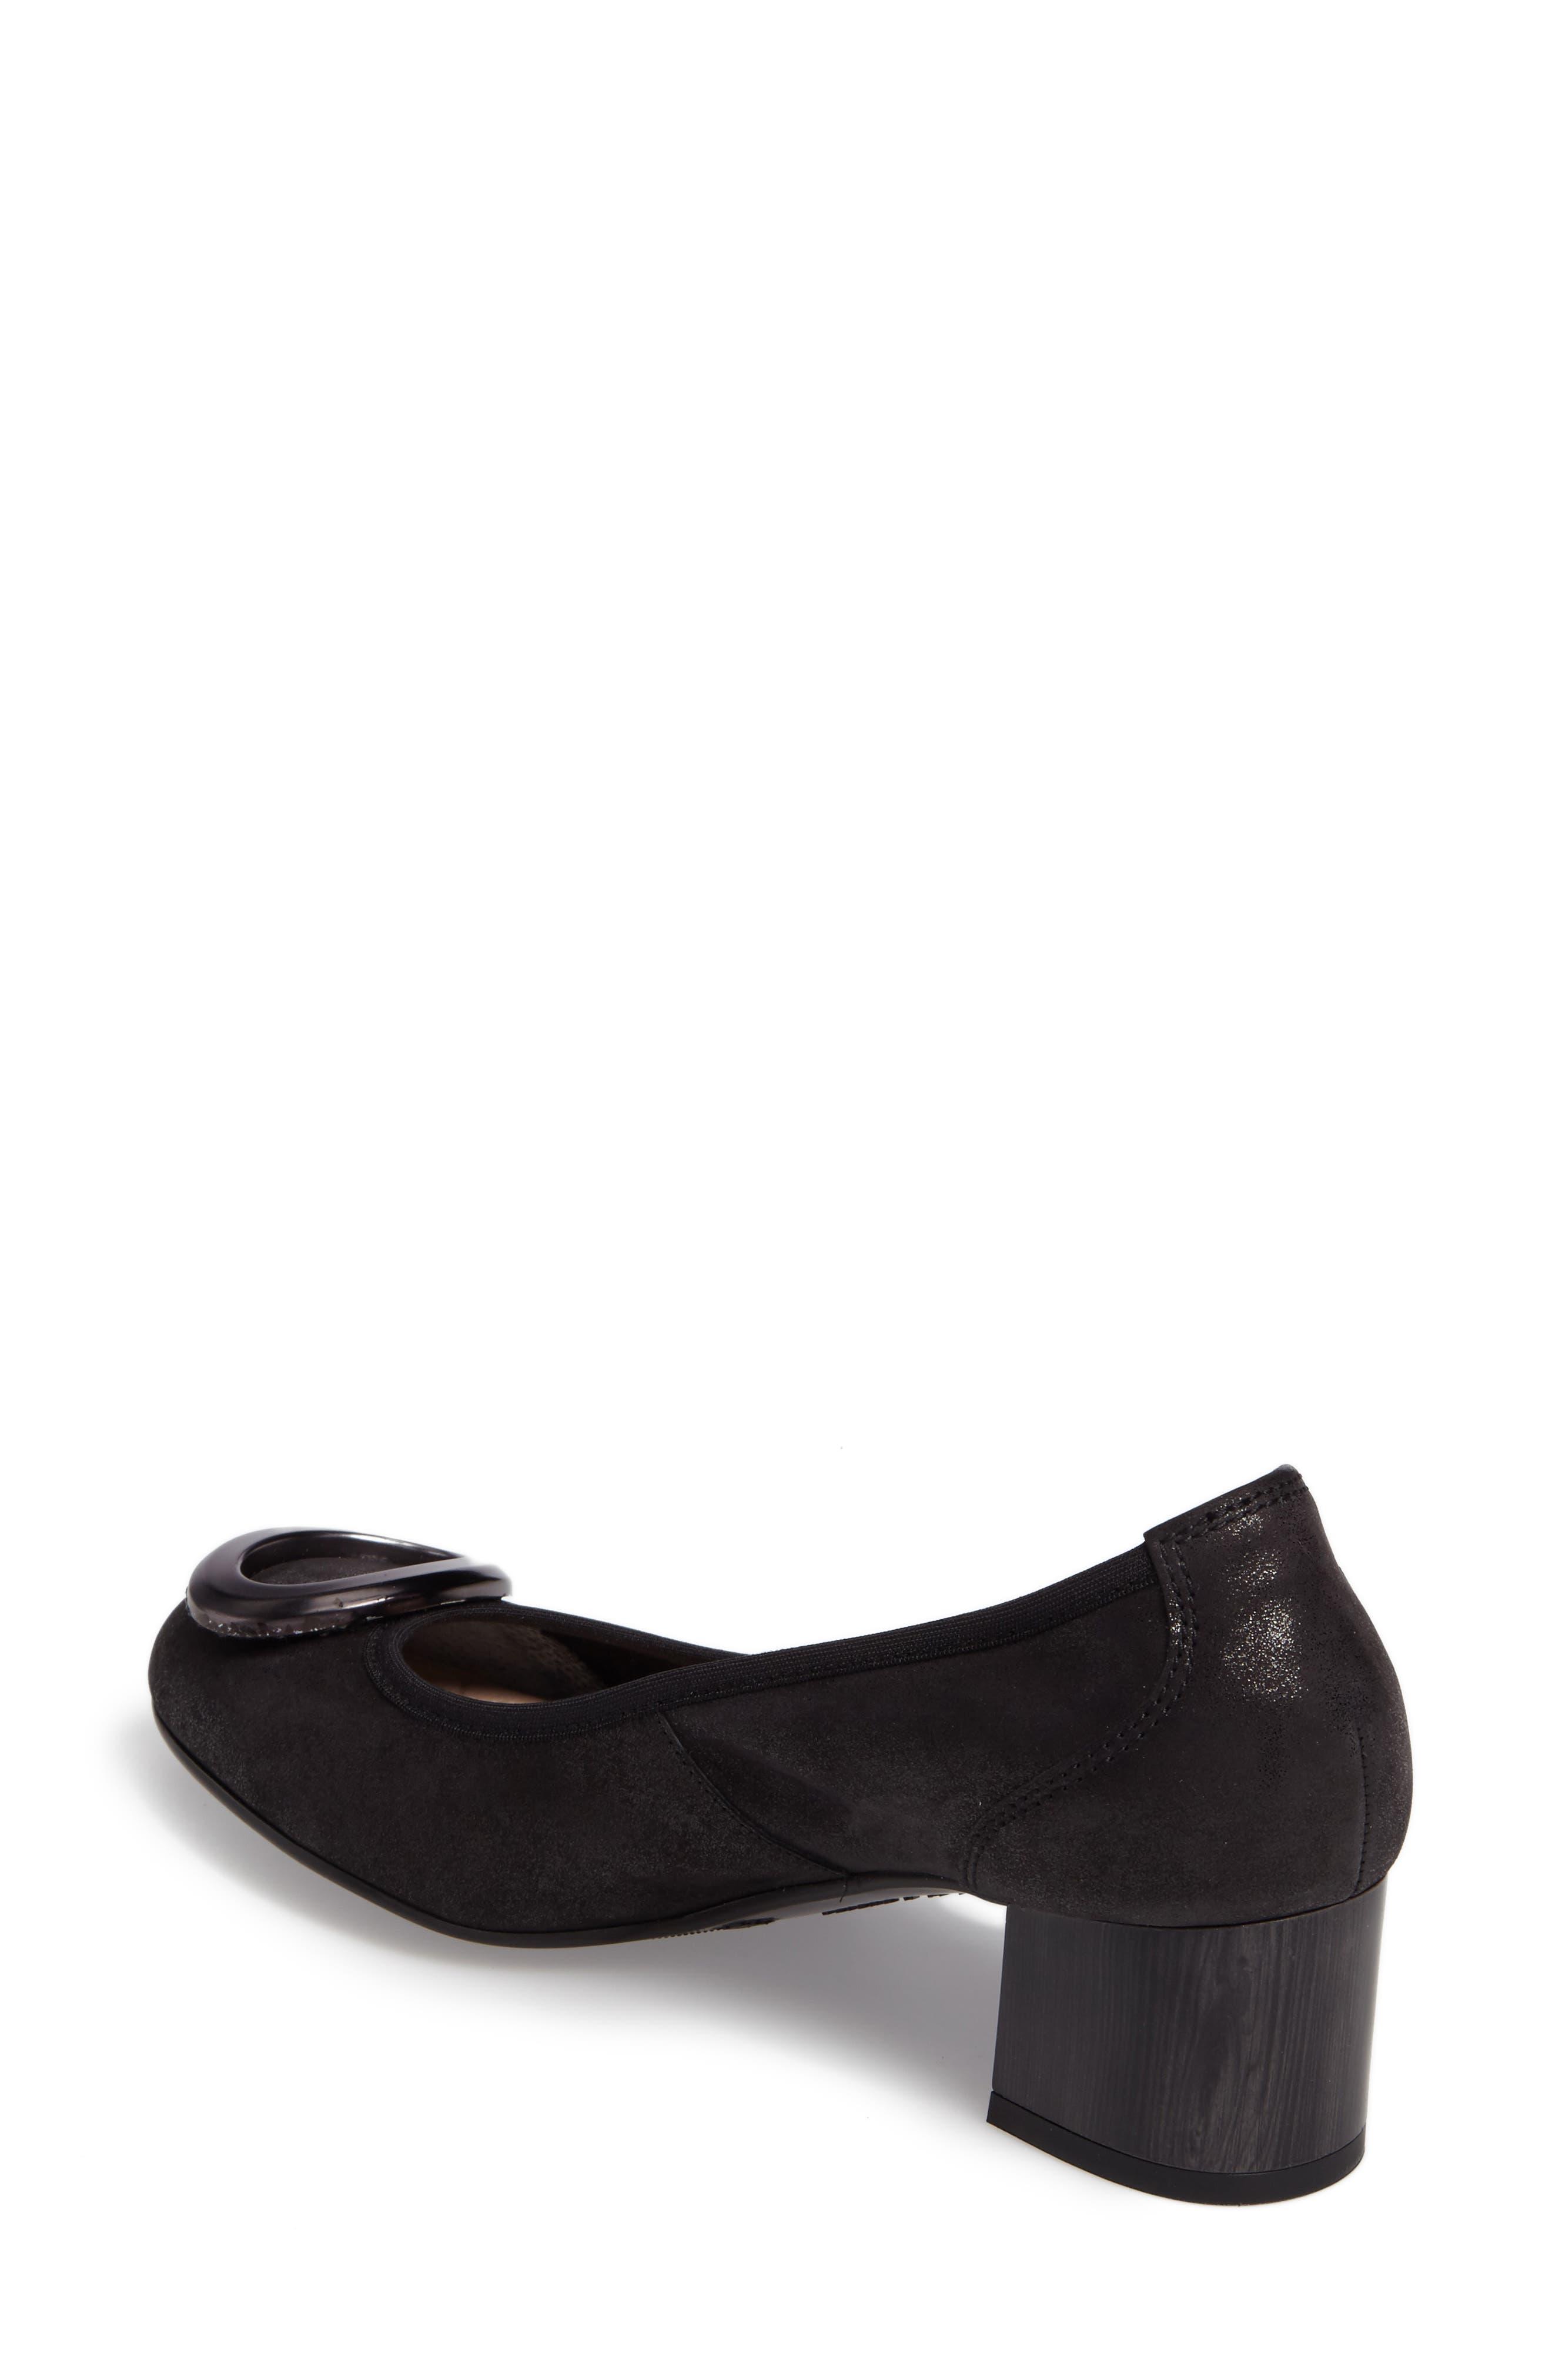 Jayla Brooch Toe Pump,                             Alternate thumbnail 2, color,                             Magic Black Leather